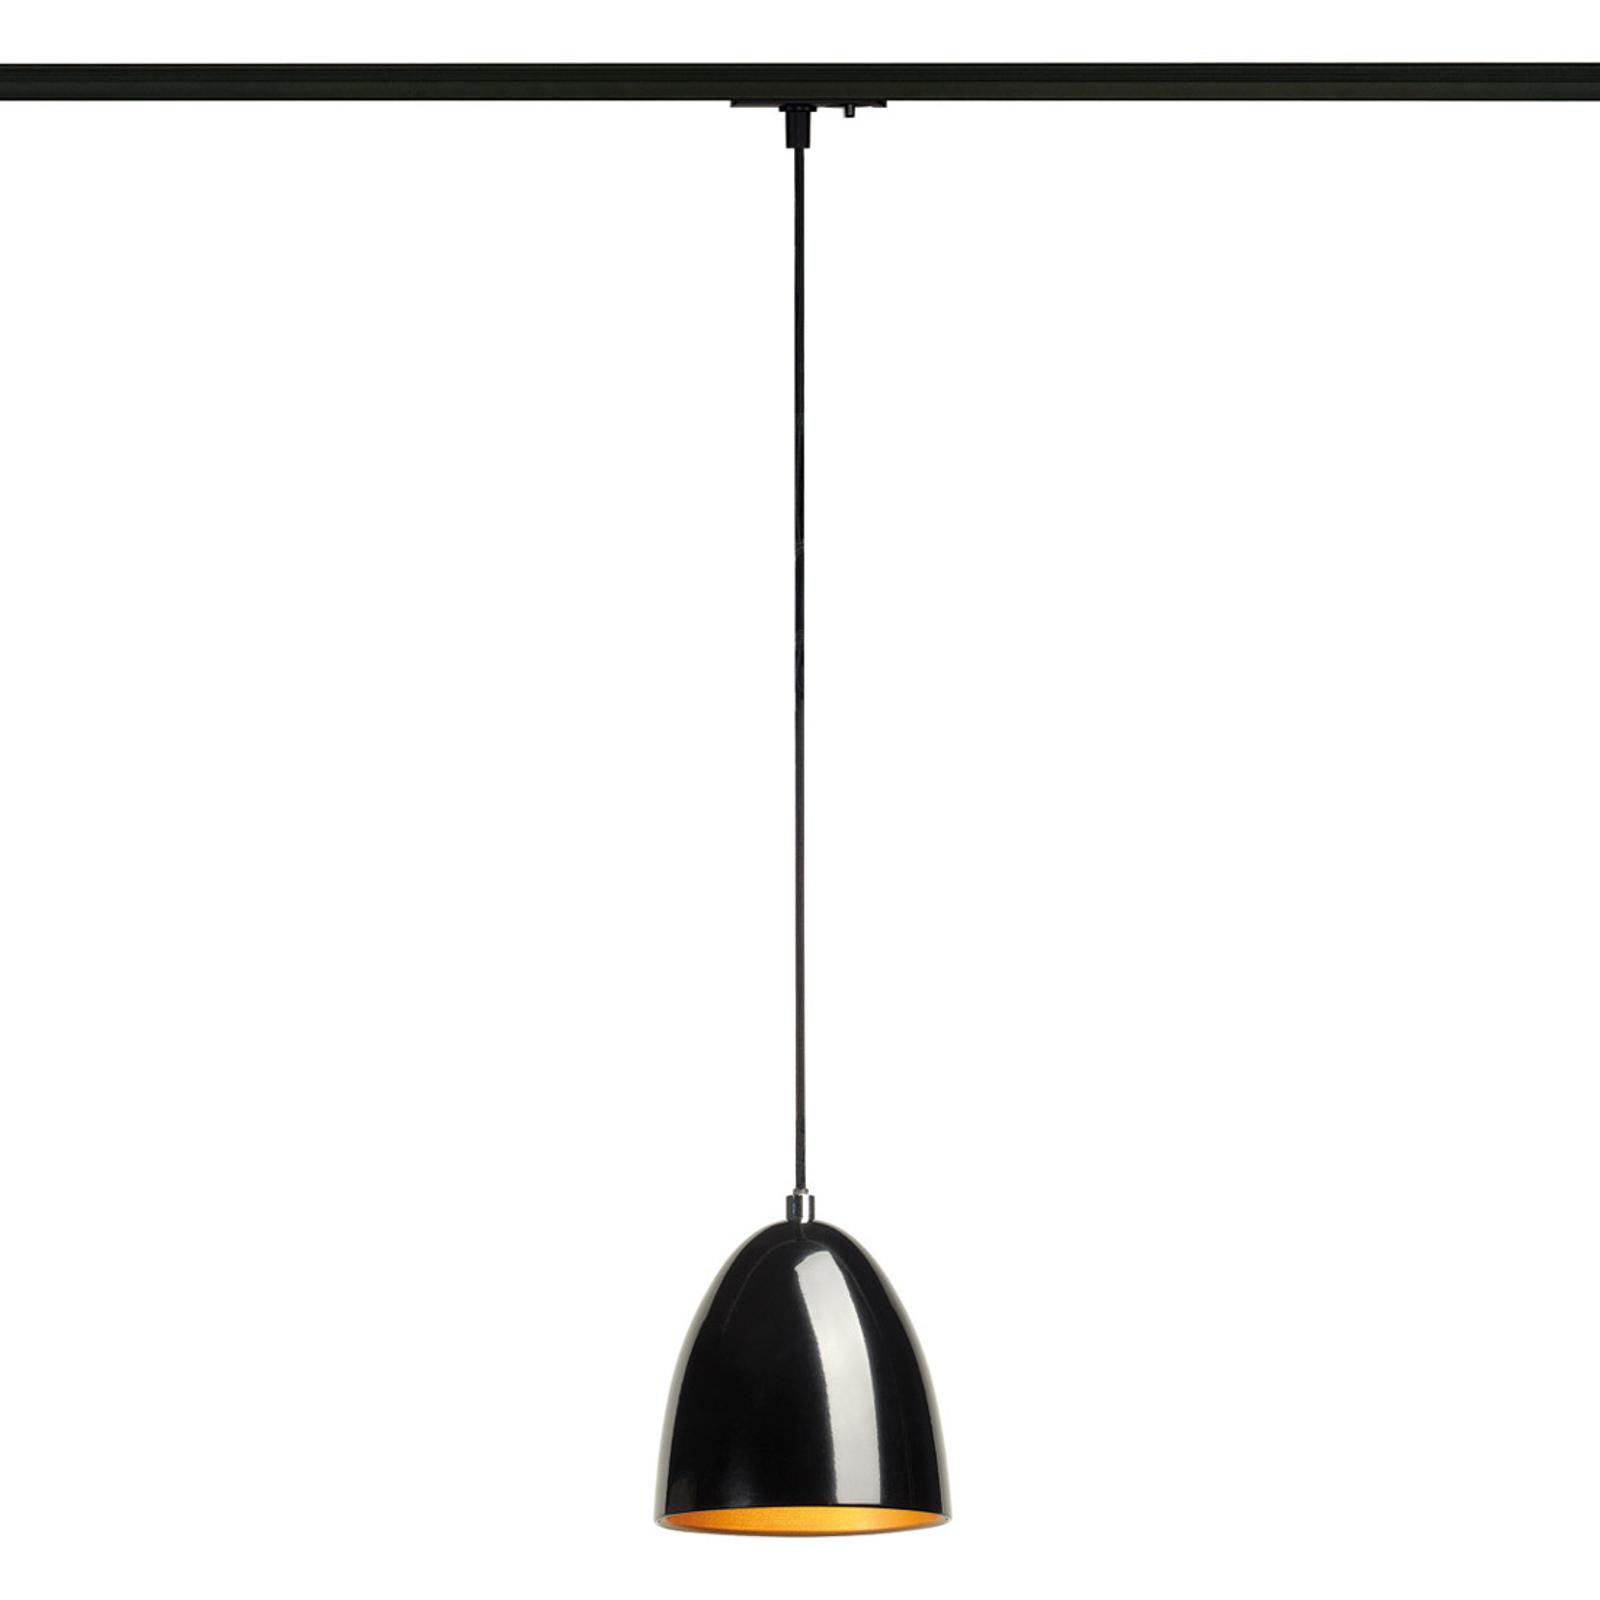 Black-gold Para Cone hanging lamp 1-circuit tracks_5504690_1